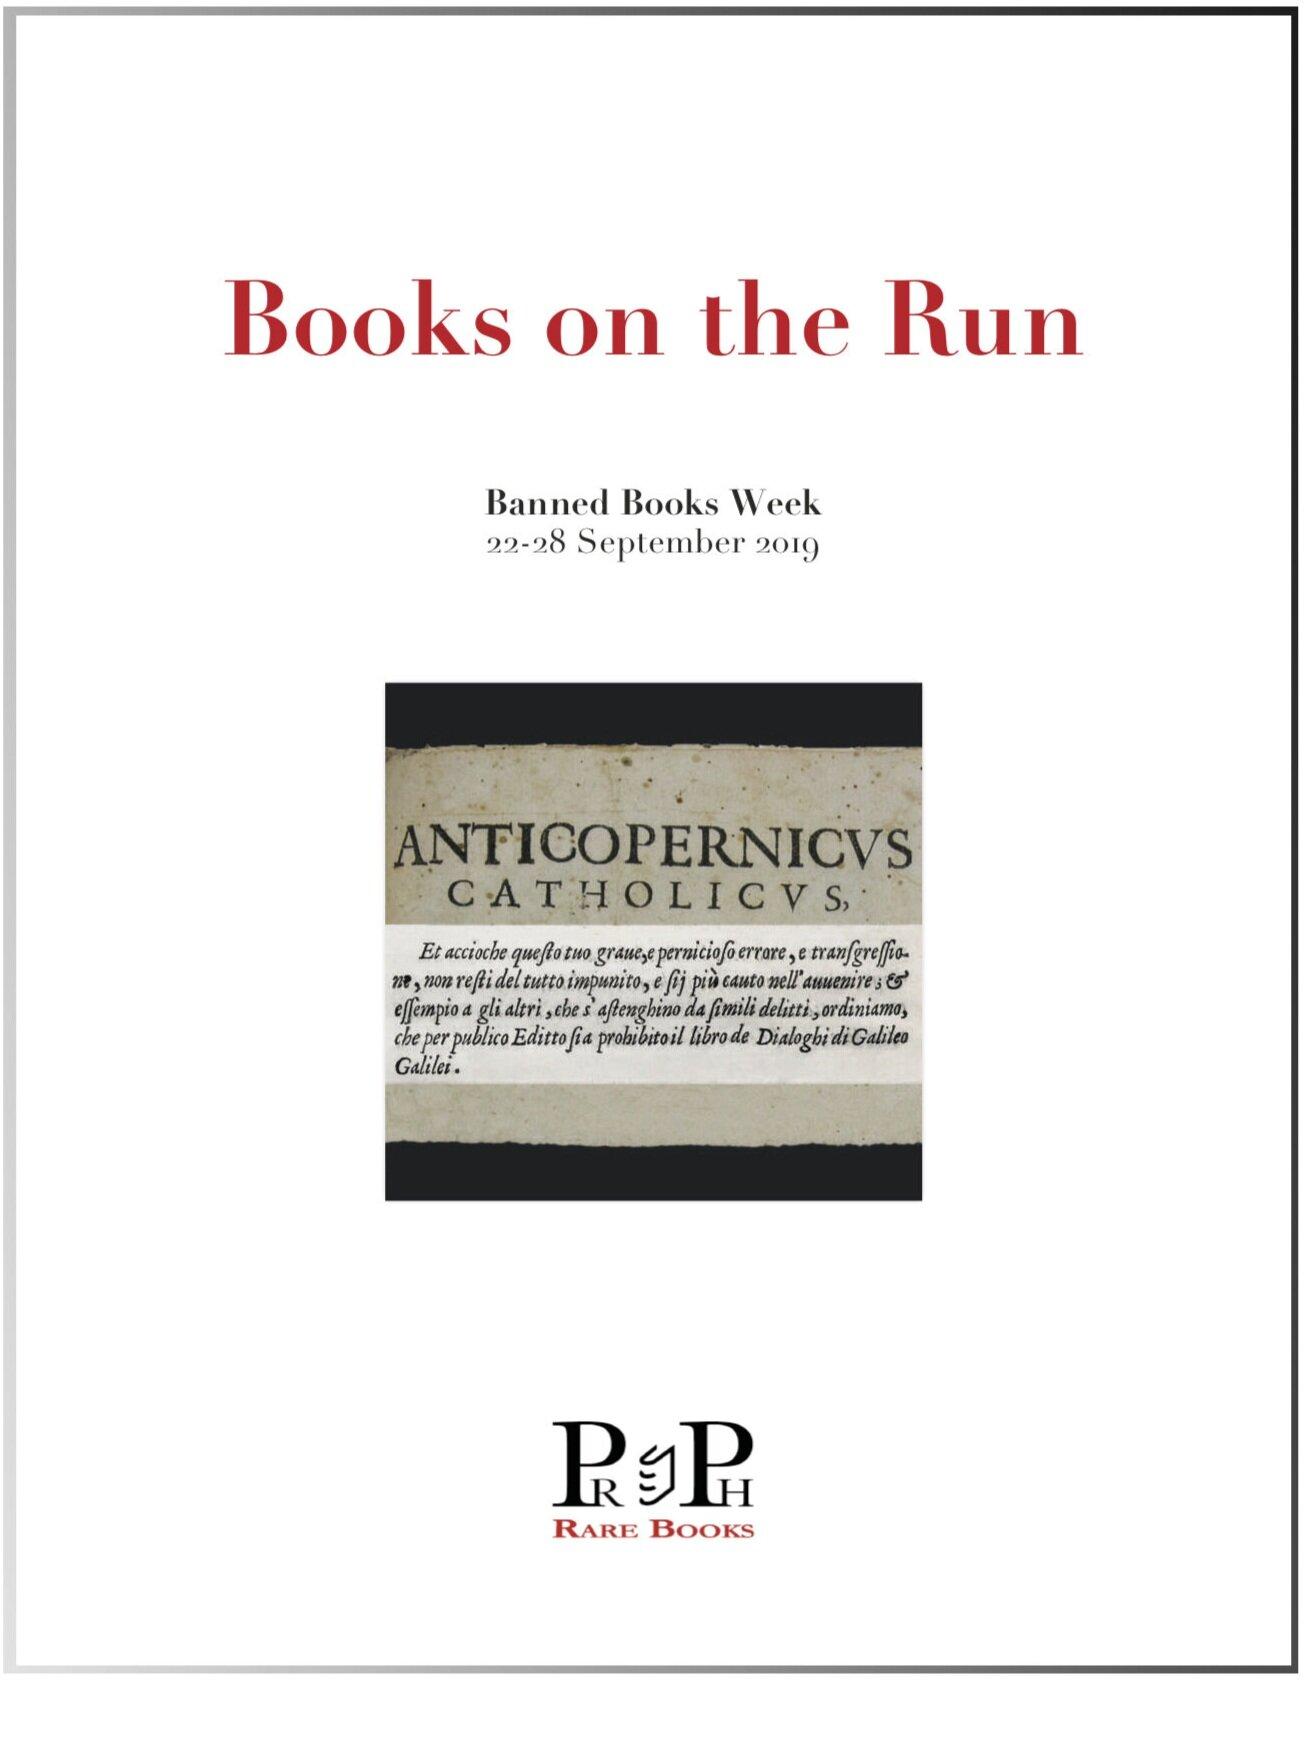 Books+on+the+Run+cover.jpg